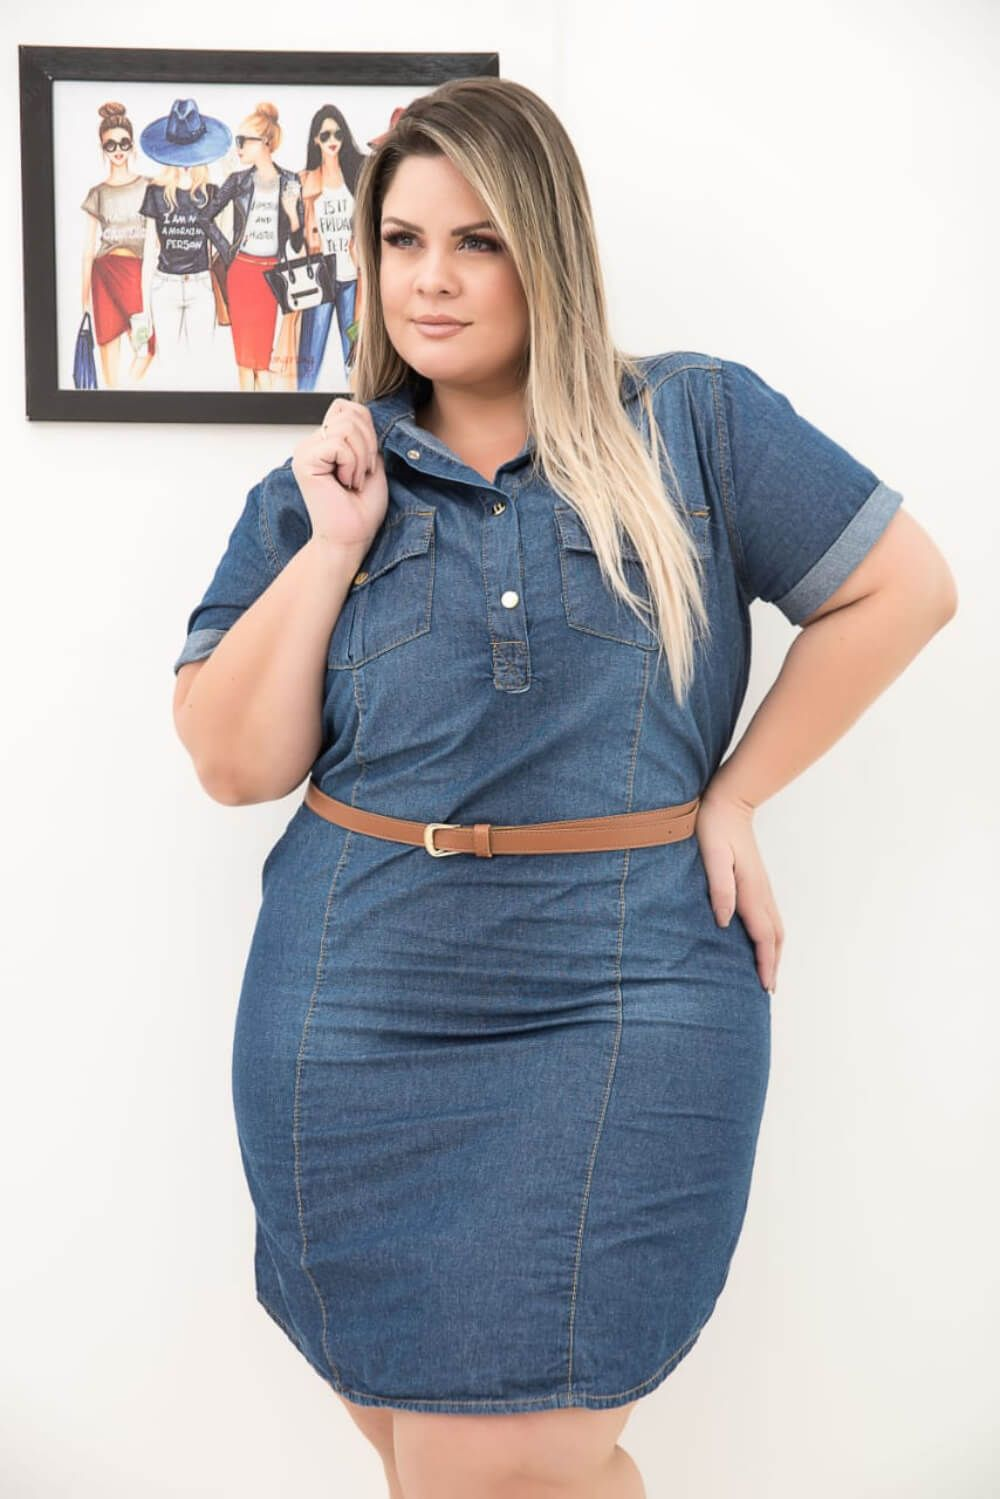 Vestido Feminino Jeans Plus Size com Manga Xtracharmy